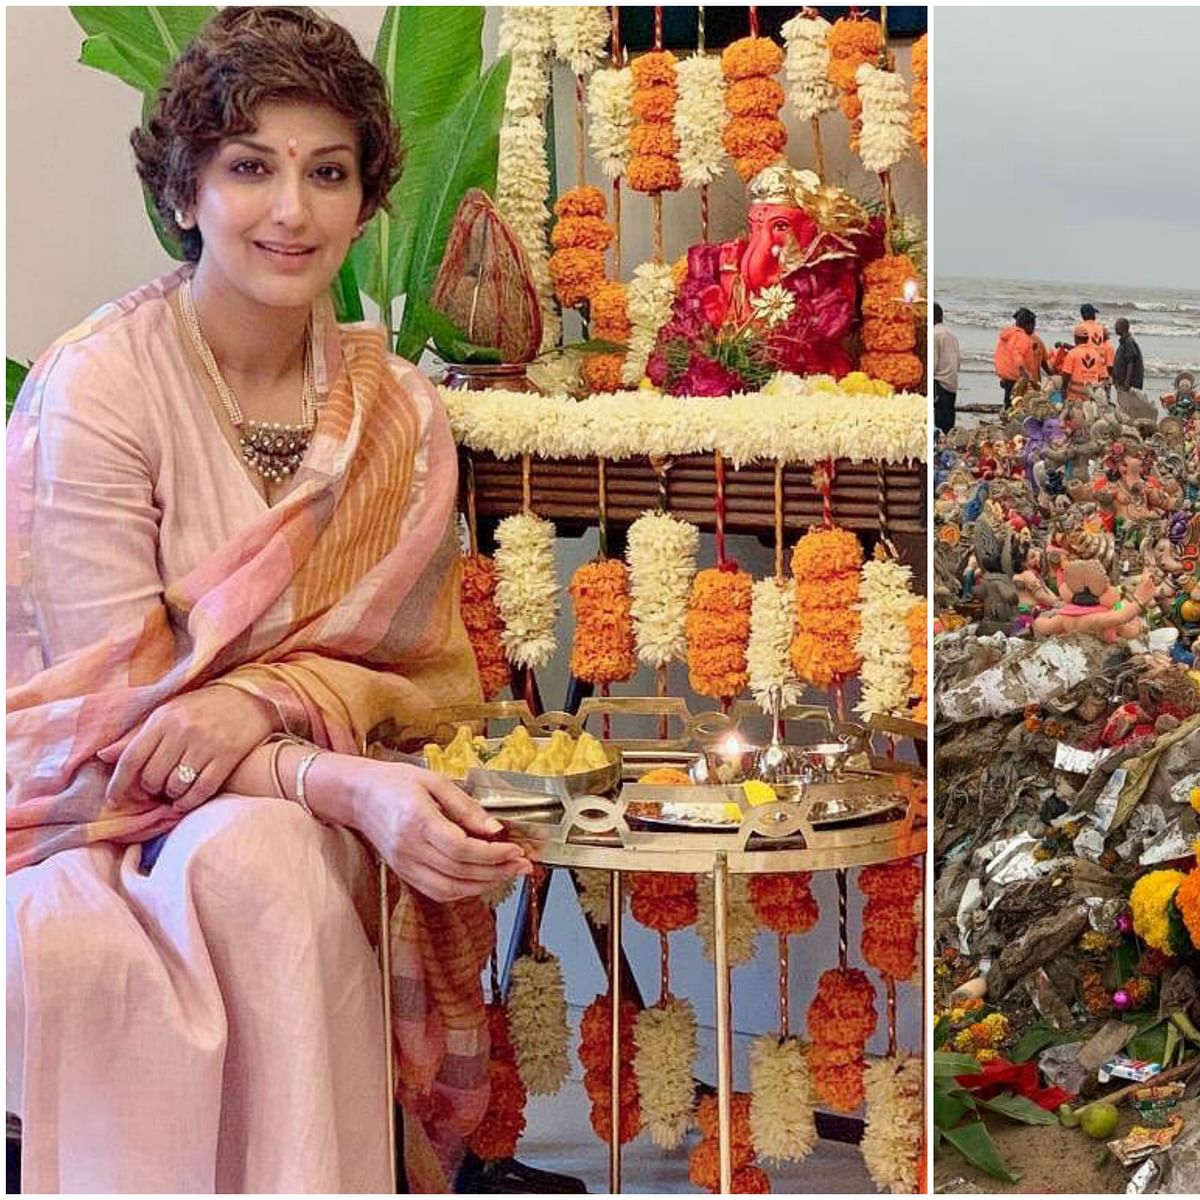 Sonali Bendre concerned about pollution caused by Ganesh Visarjan